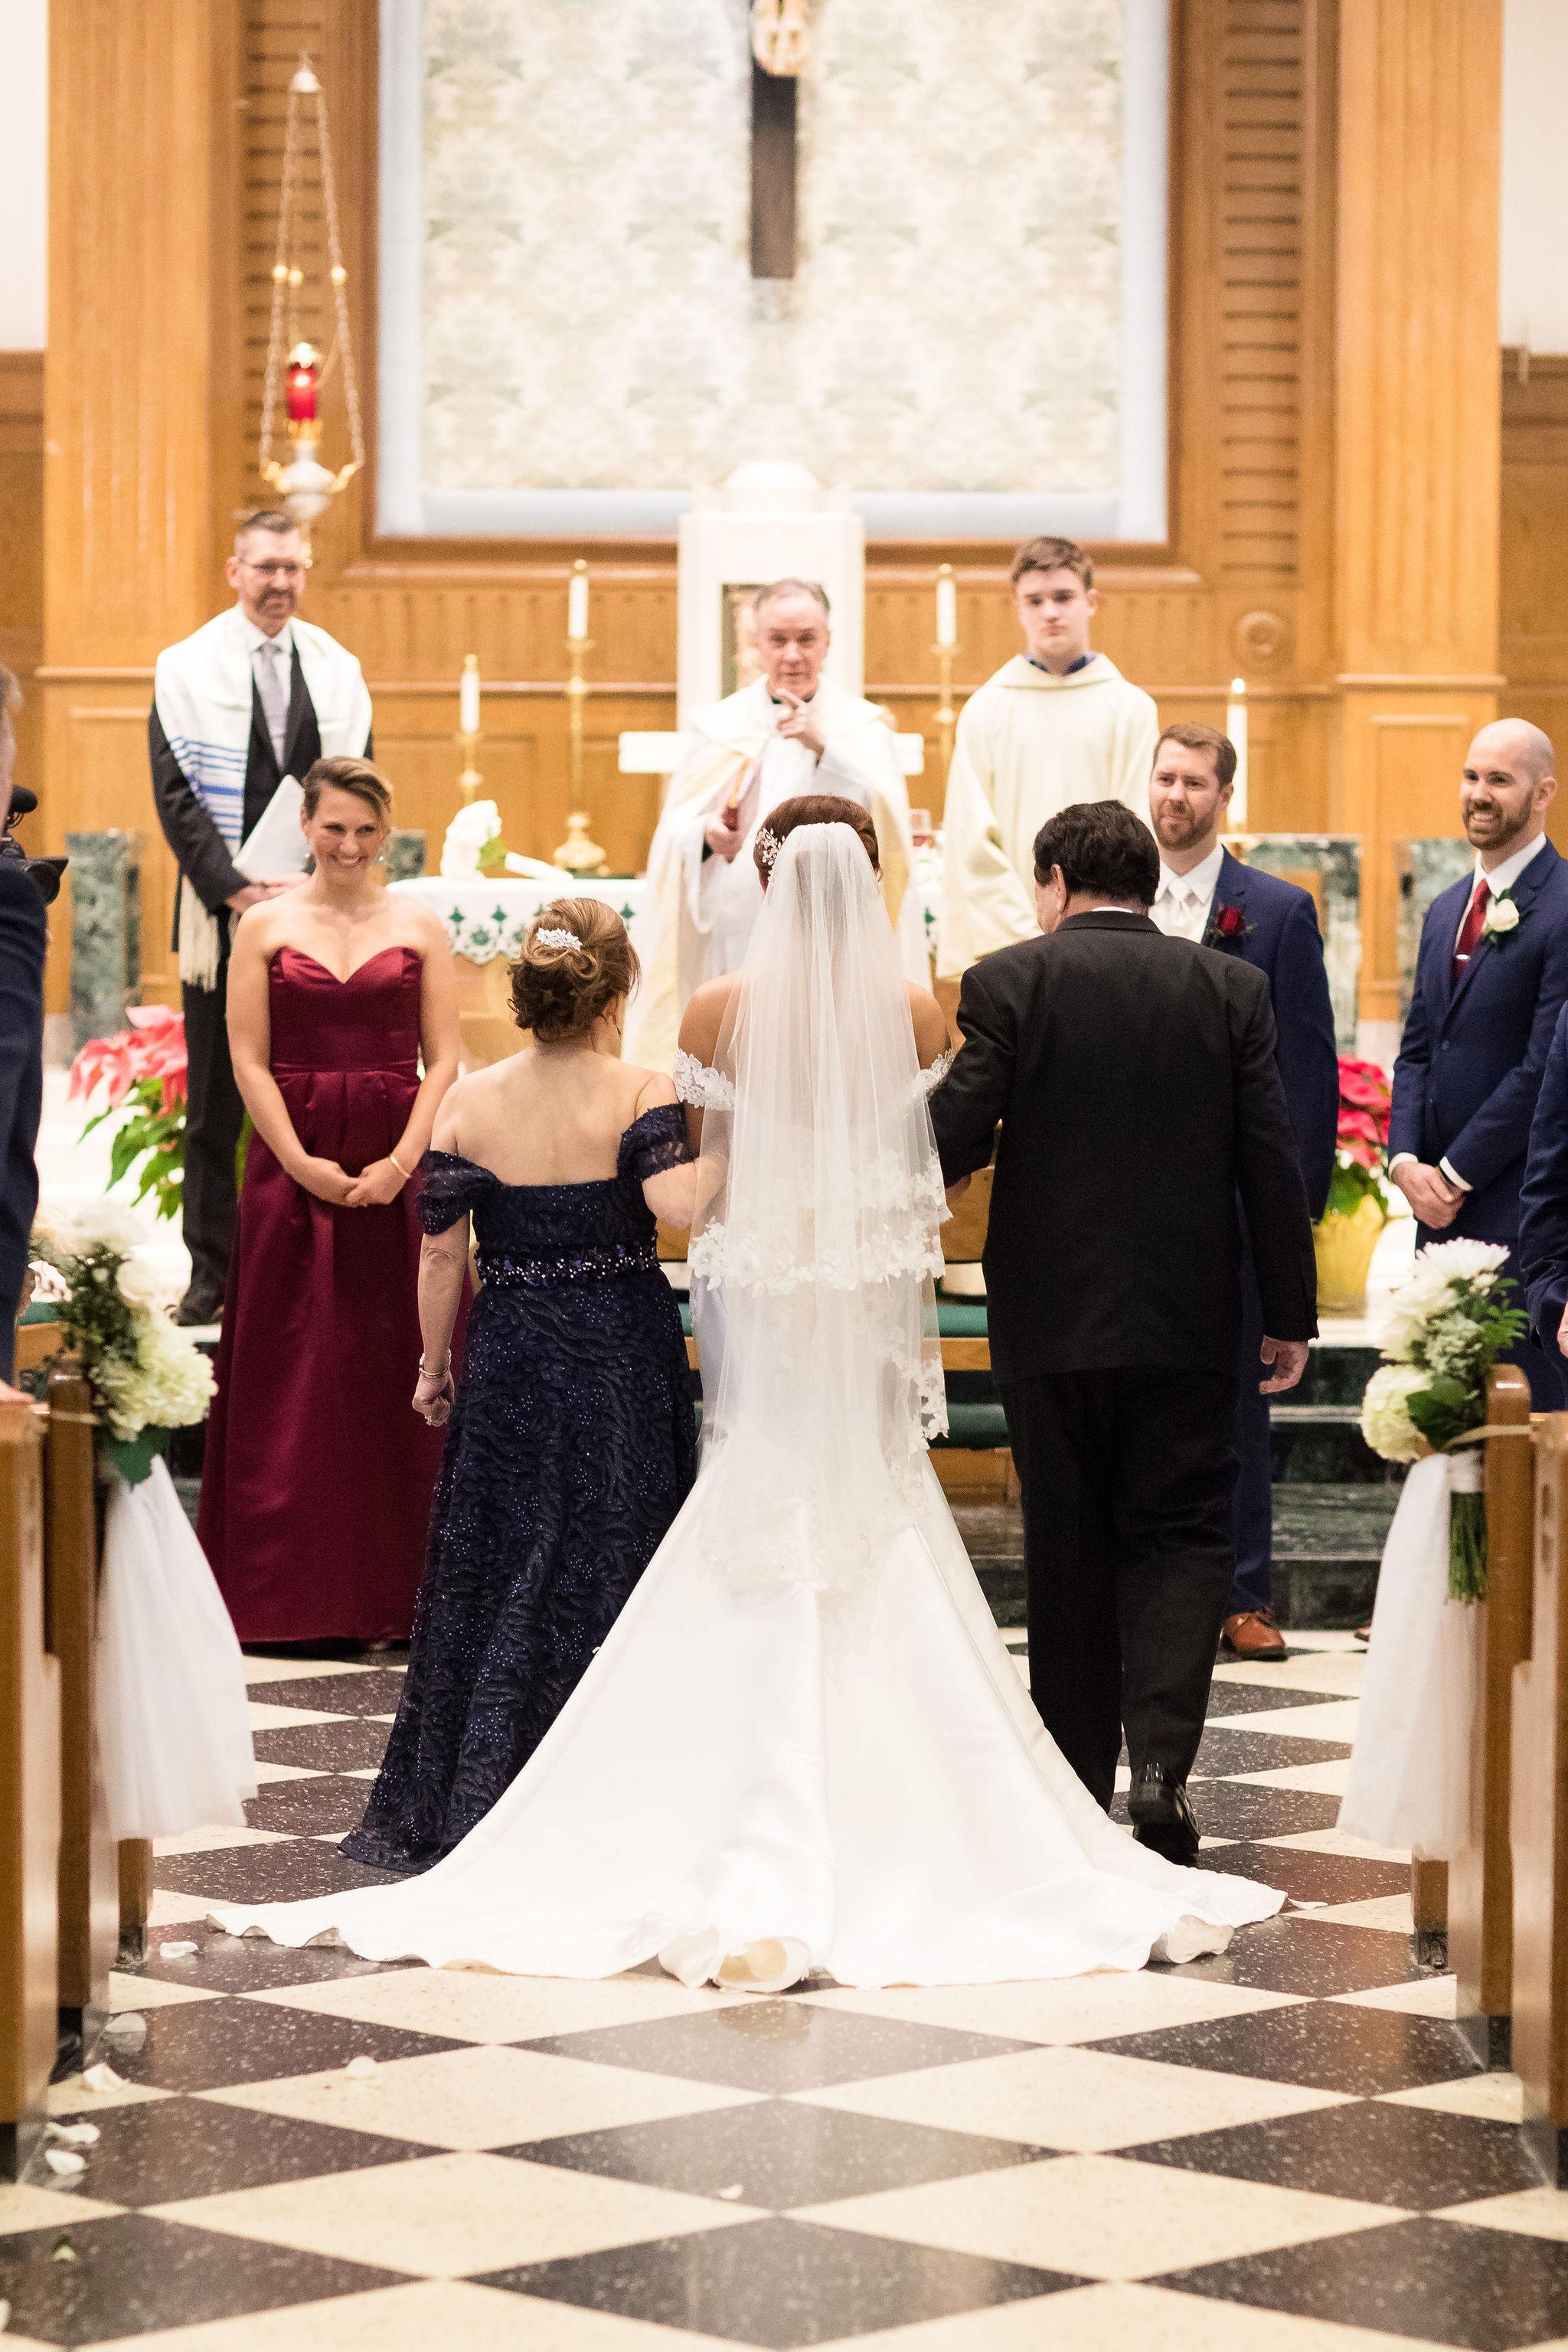 lisa-dan-wedding-ceremony-83.JPG